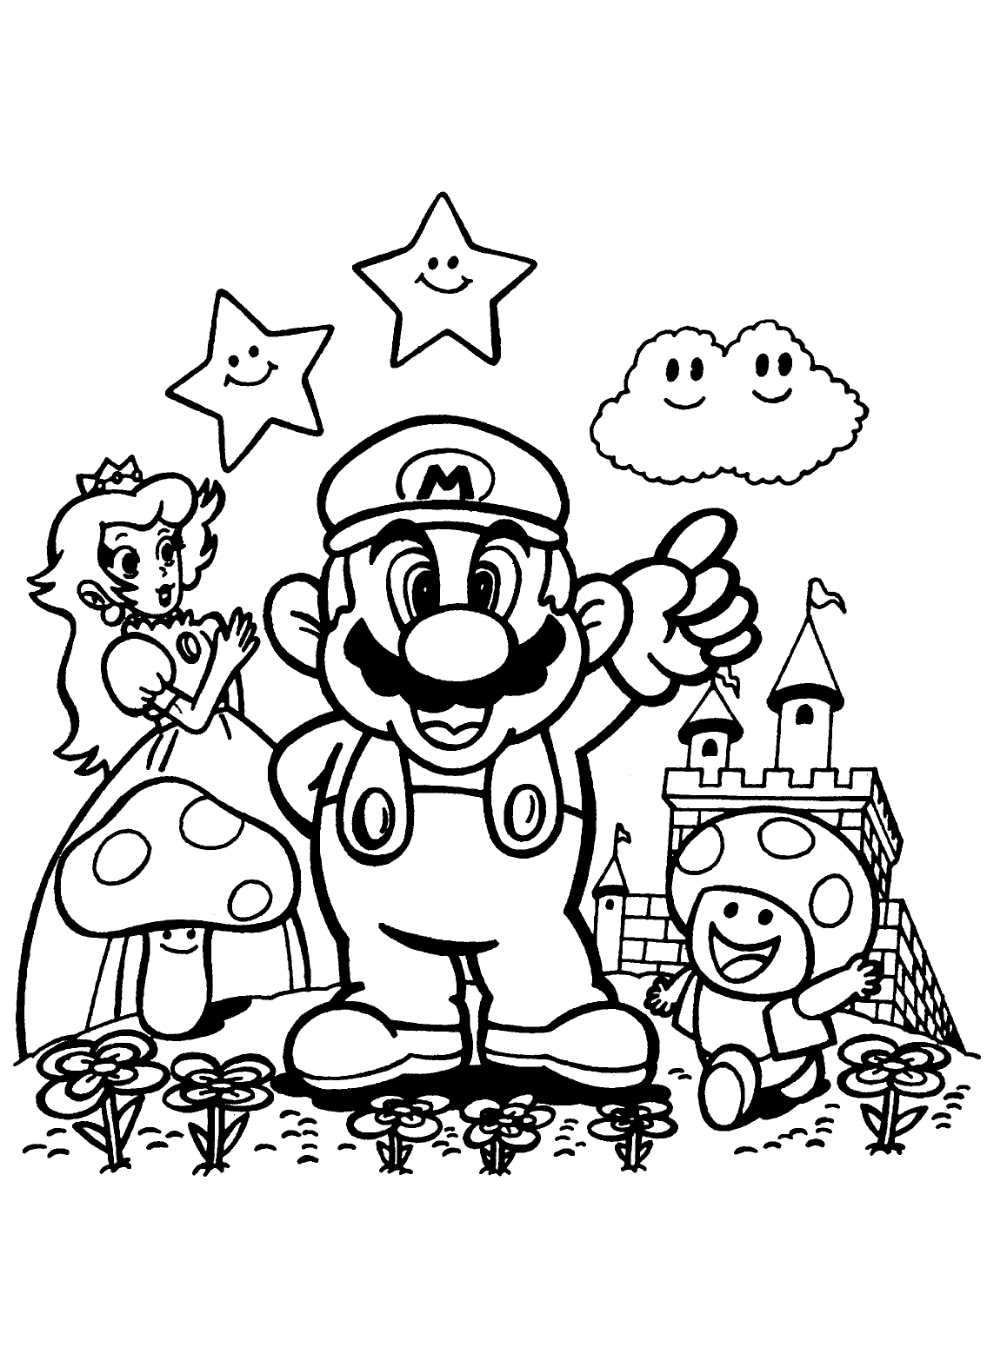 Kleurplaten Paradijs Kleurplaat Prinses Paddestoel En Mario Kleurplaten Kleurplaten Voor Kinderen Mario